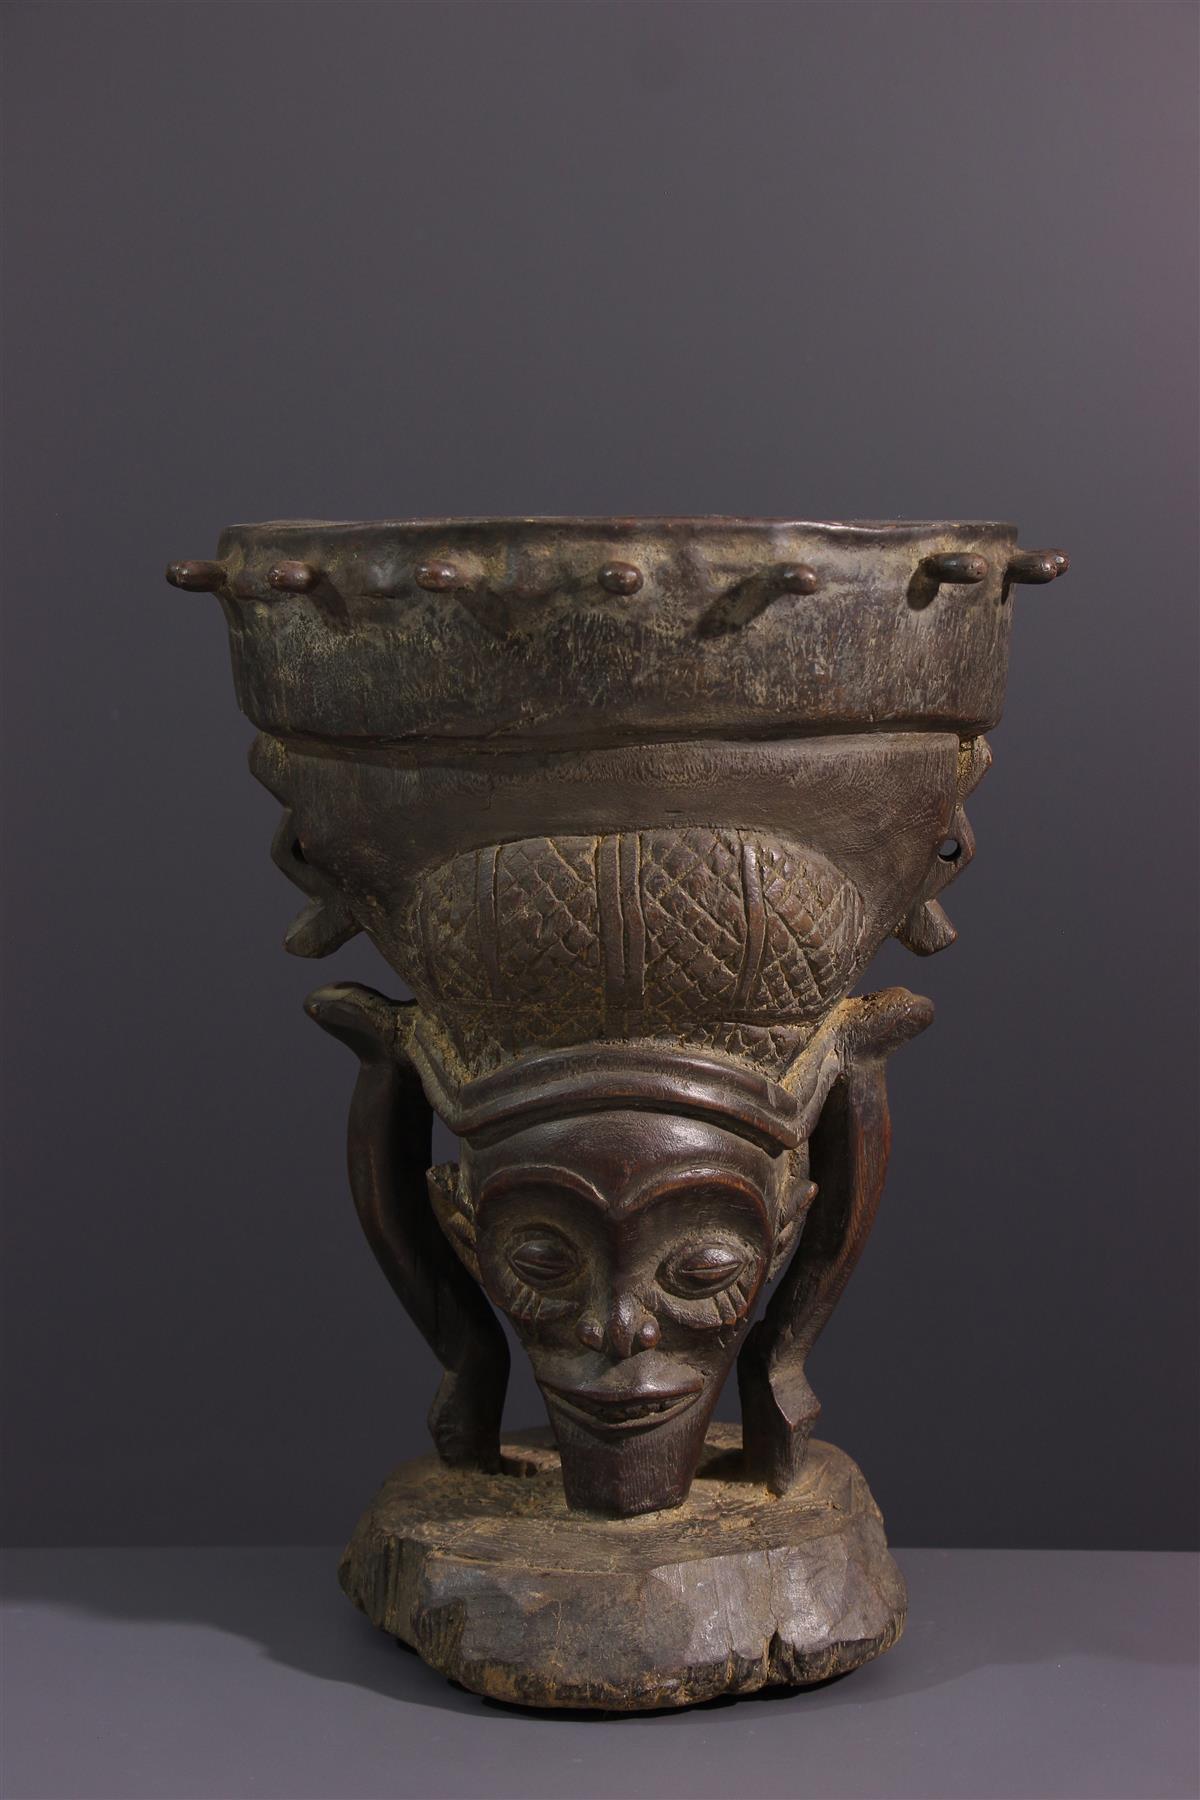 Chokwe Drum - African art